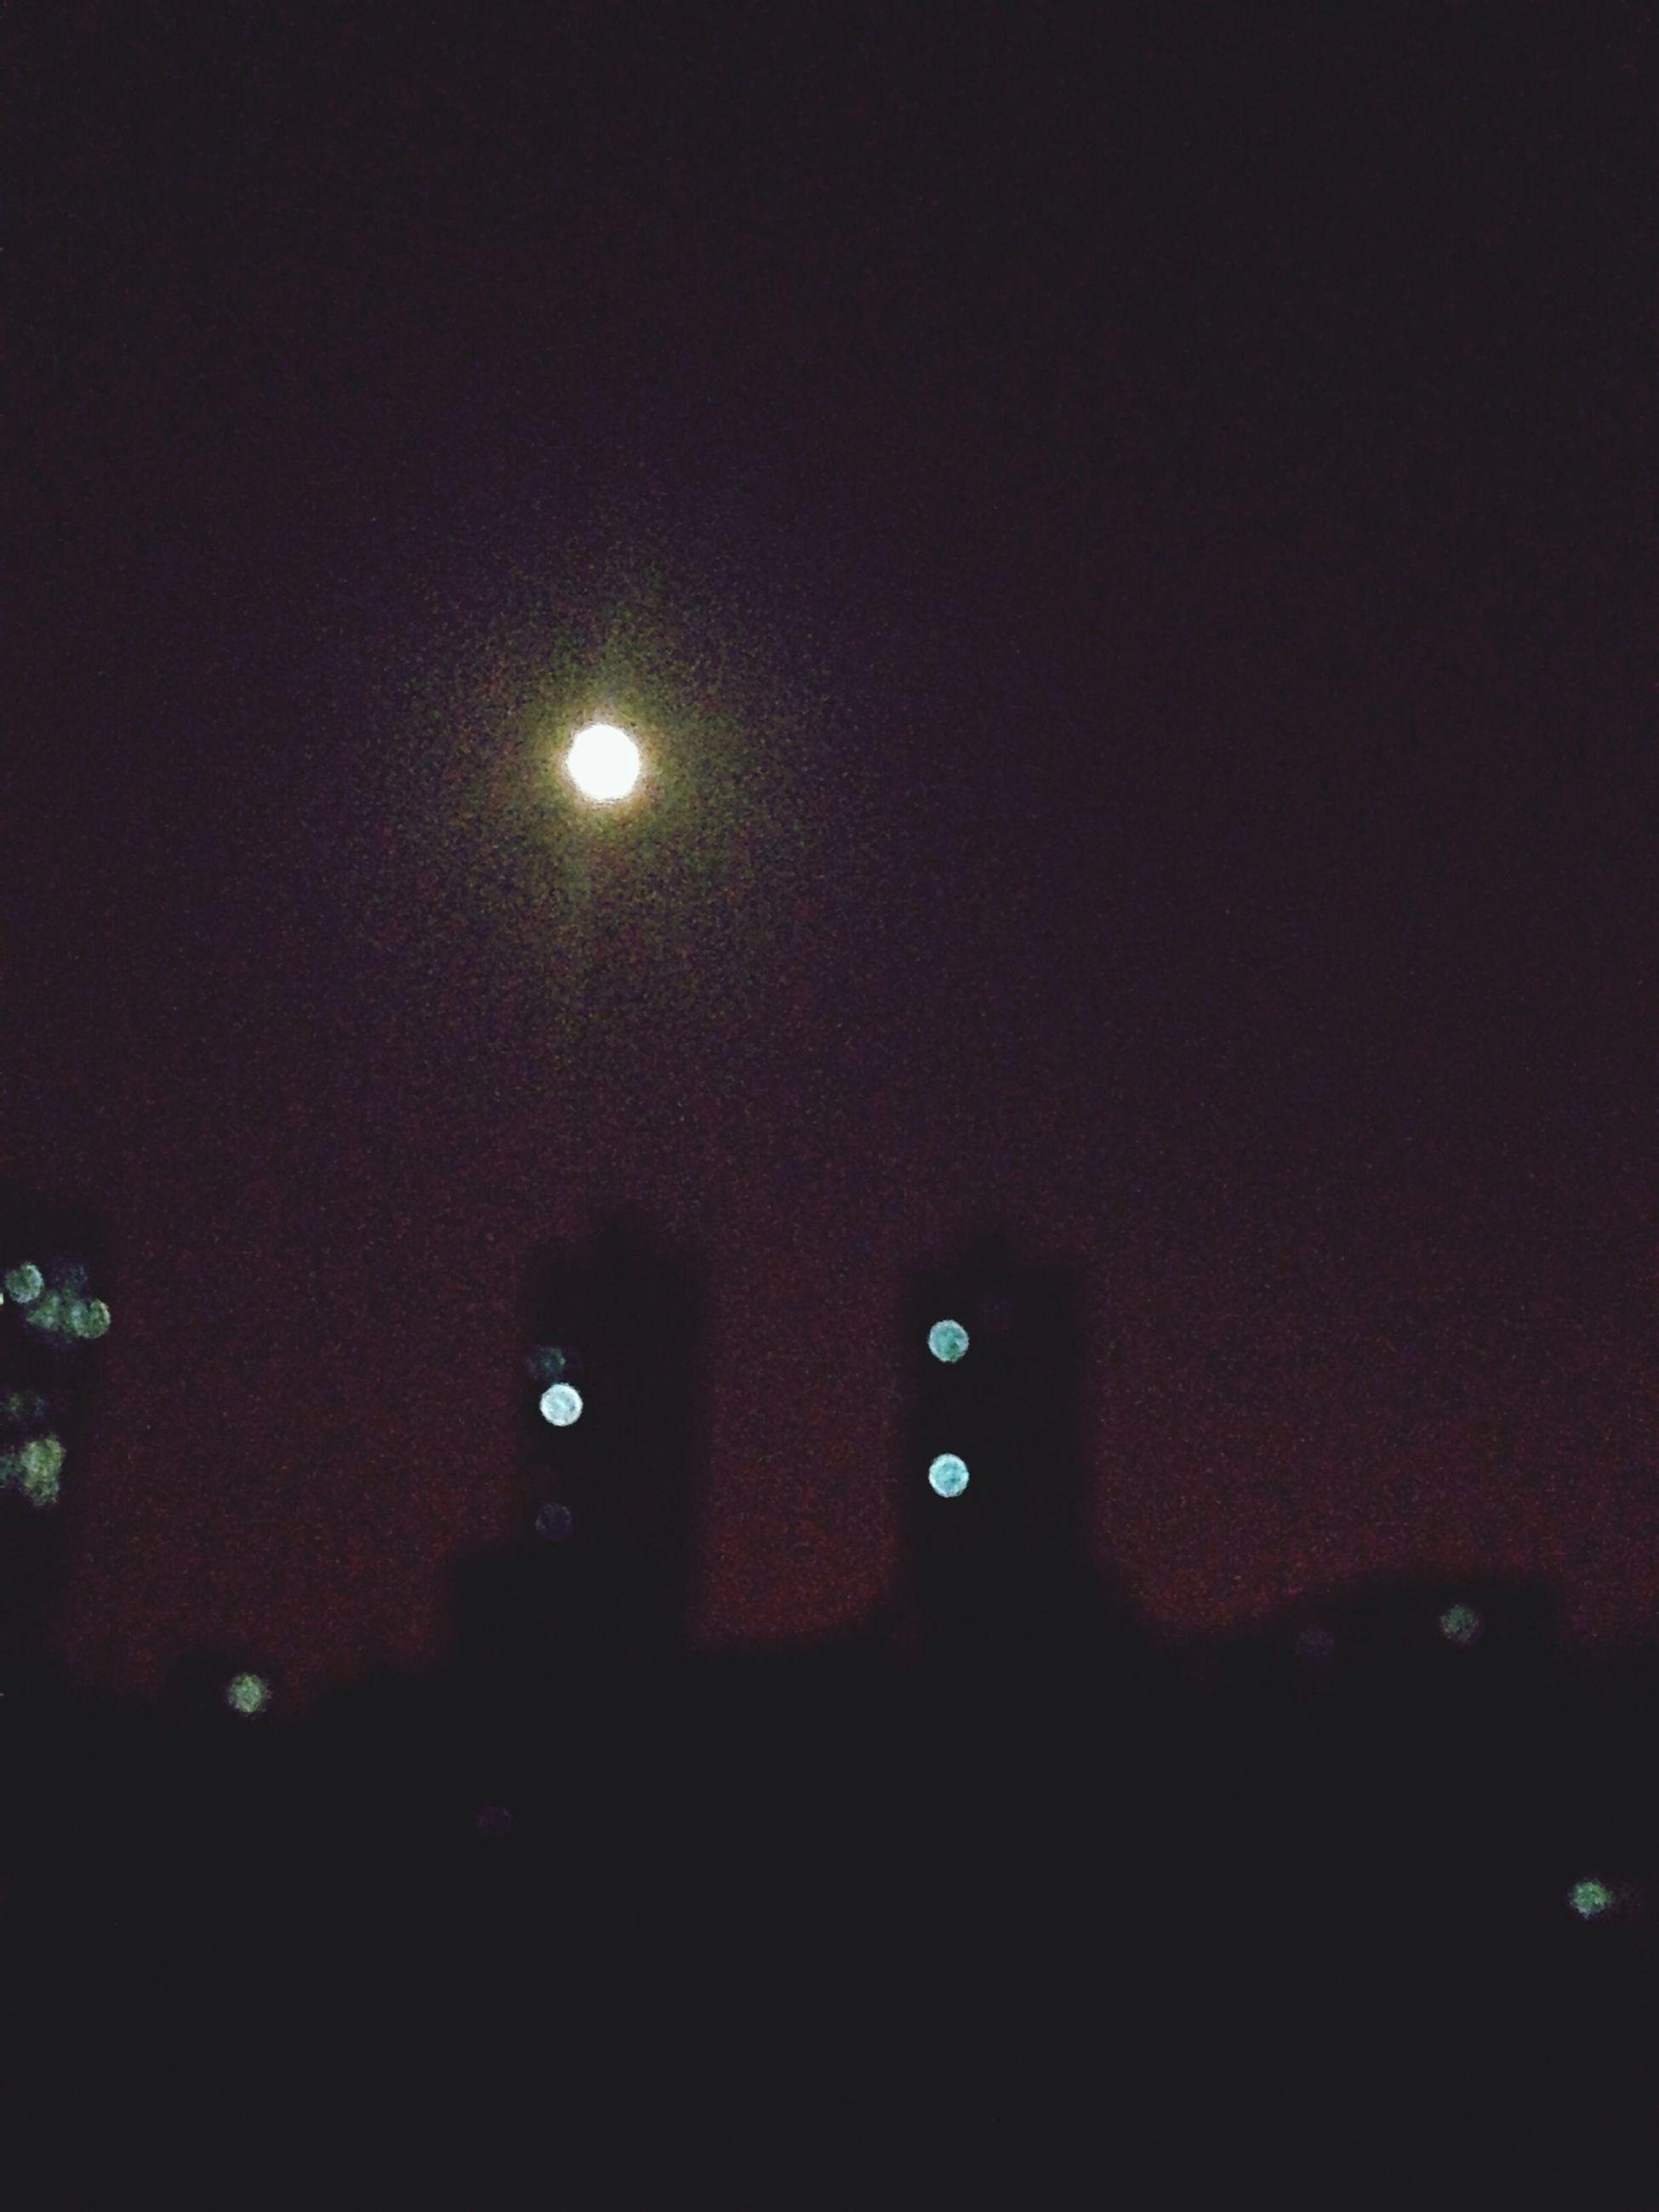 night, illuminated, lighting equipment, dark, moon, glowing, light - natural phenomenon, circle, low angle view, indoors, astronomy, defocused, sky, no people, full moon, light, street light, copy space, electric light